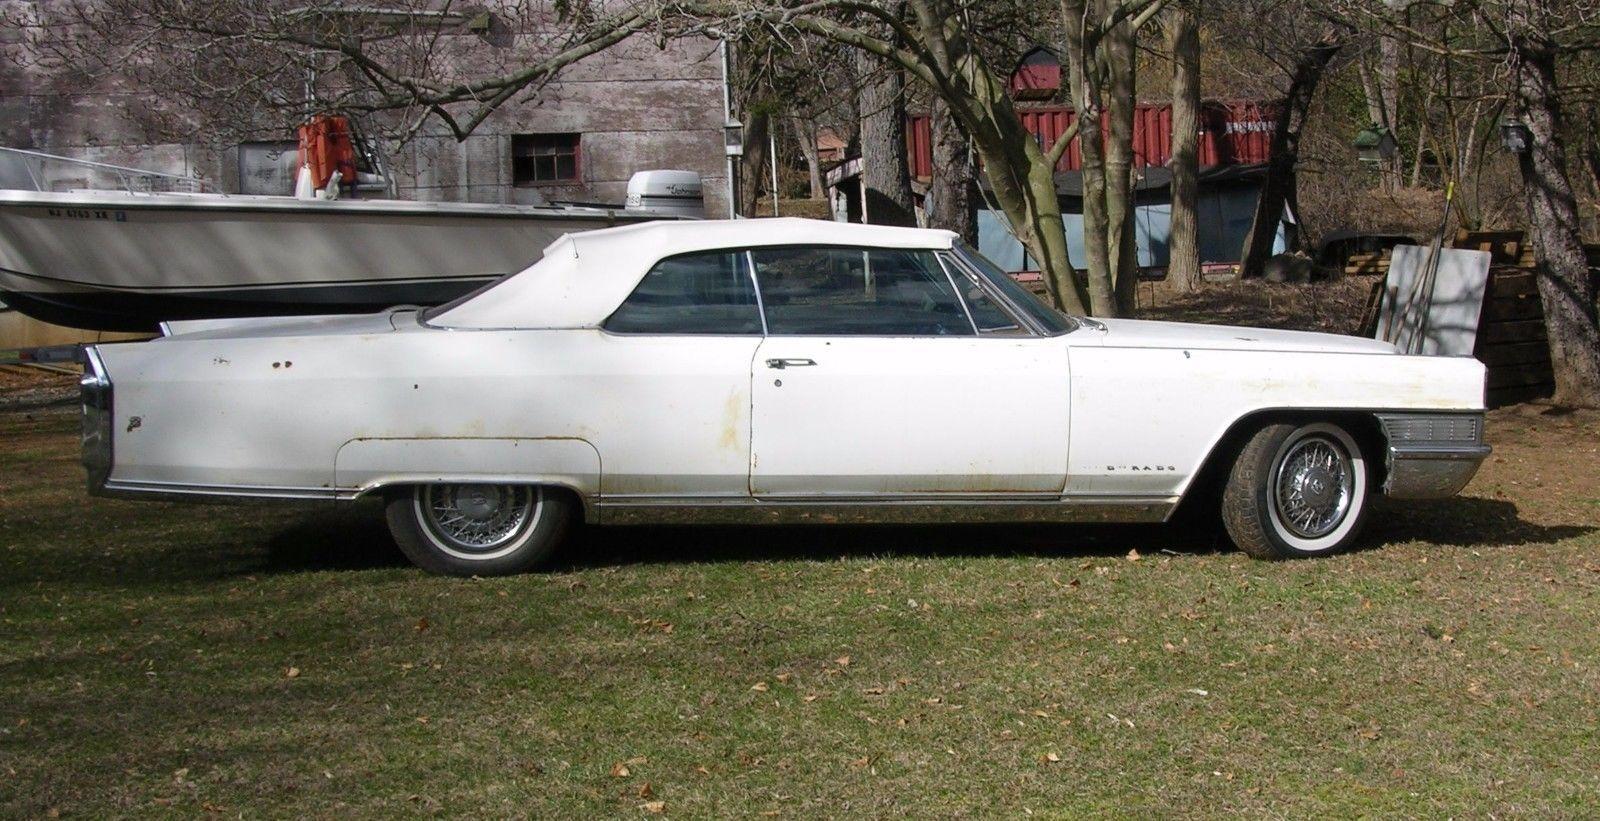 eBay: 1965 Cadillac Eldorado ELDORADO 1965 CADILLAC ELDORADO VINTAGE ...